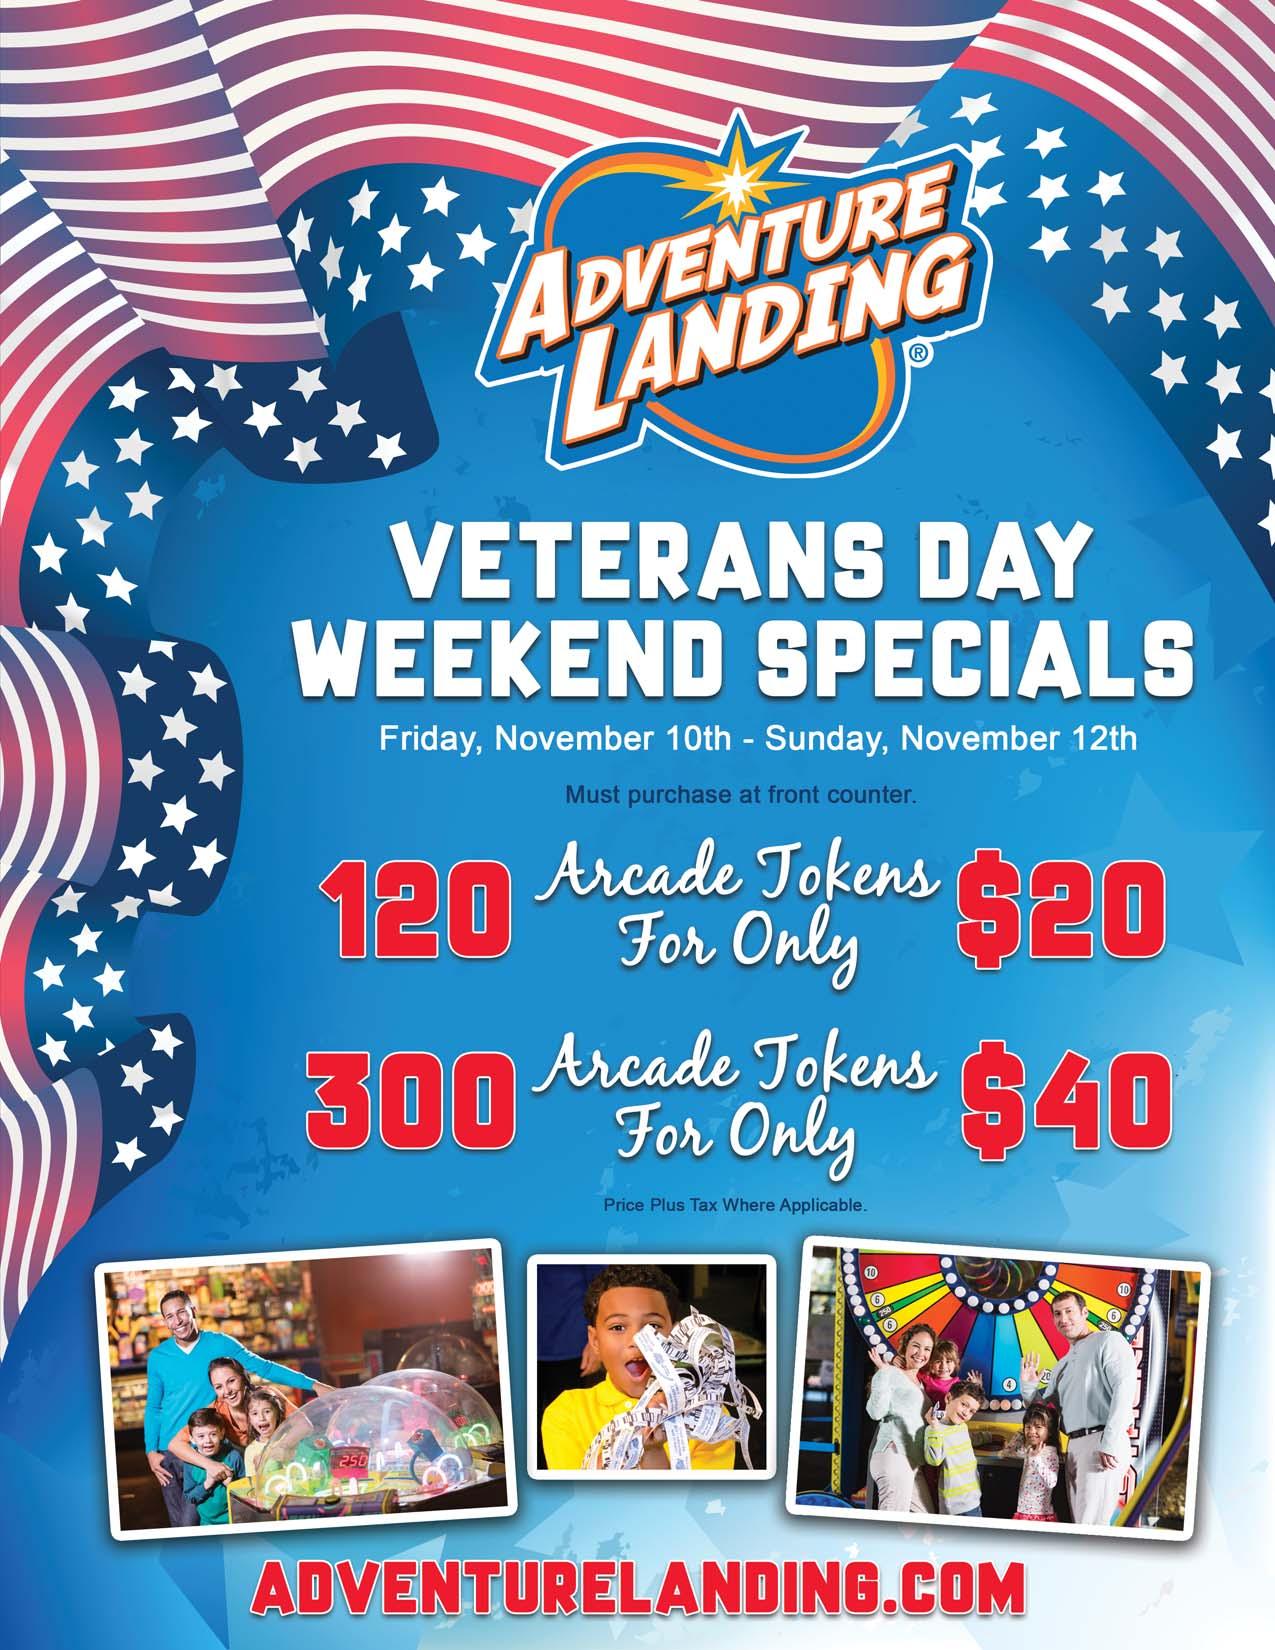 Veterans Day Weekend Specials Jacksonville Beach